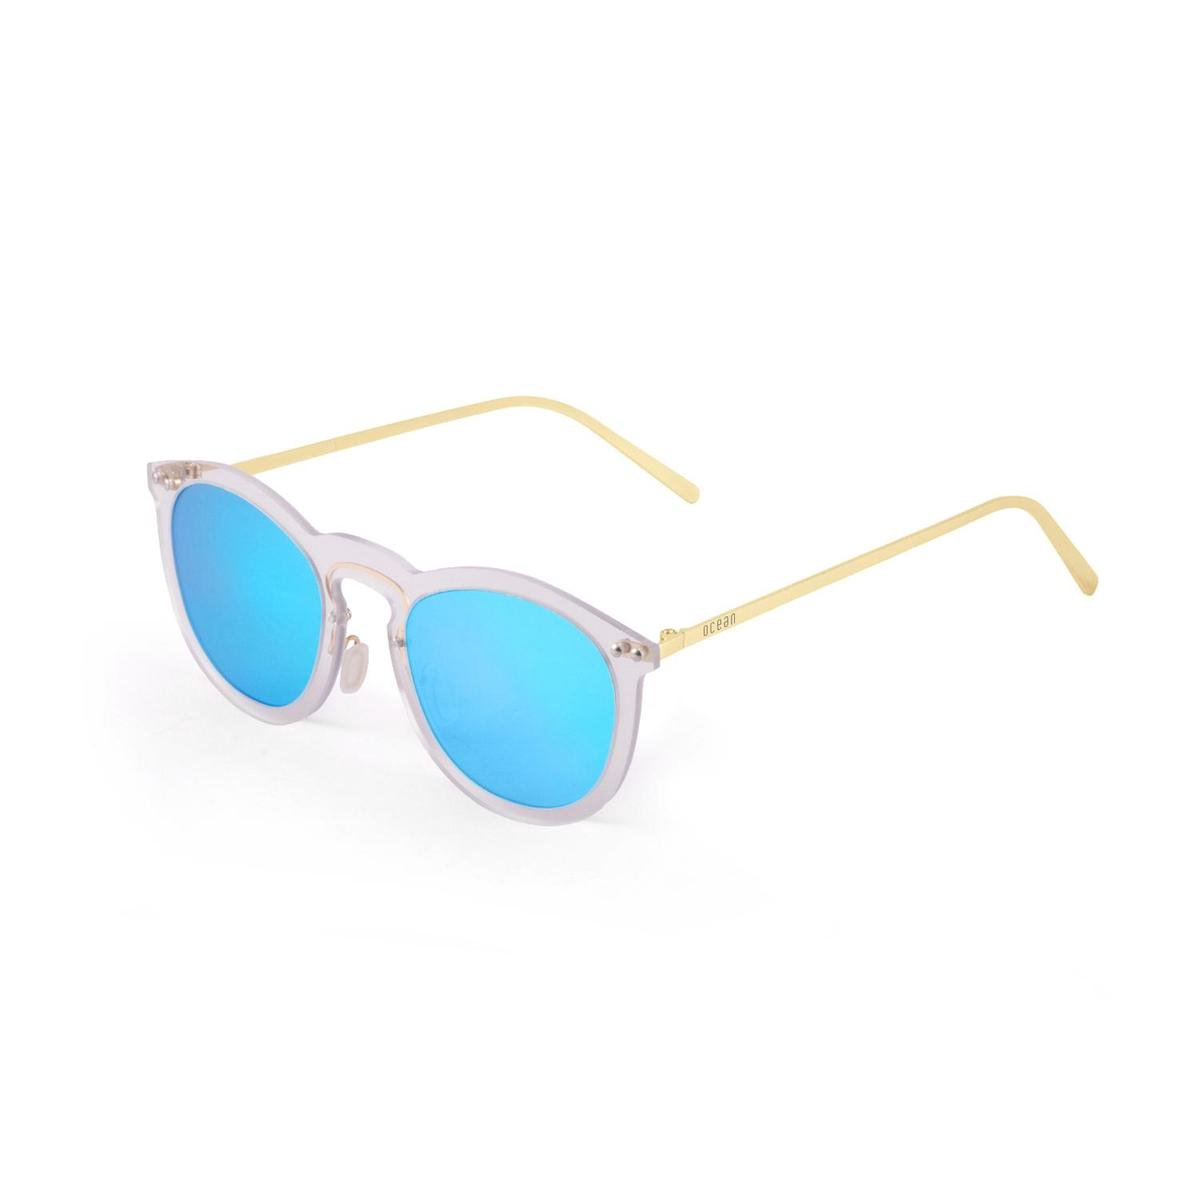 Ocean Sunglasses - HELSINKI - Unisex Zonnebril Blauw - Ocean Sunglasses